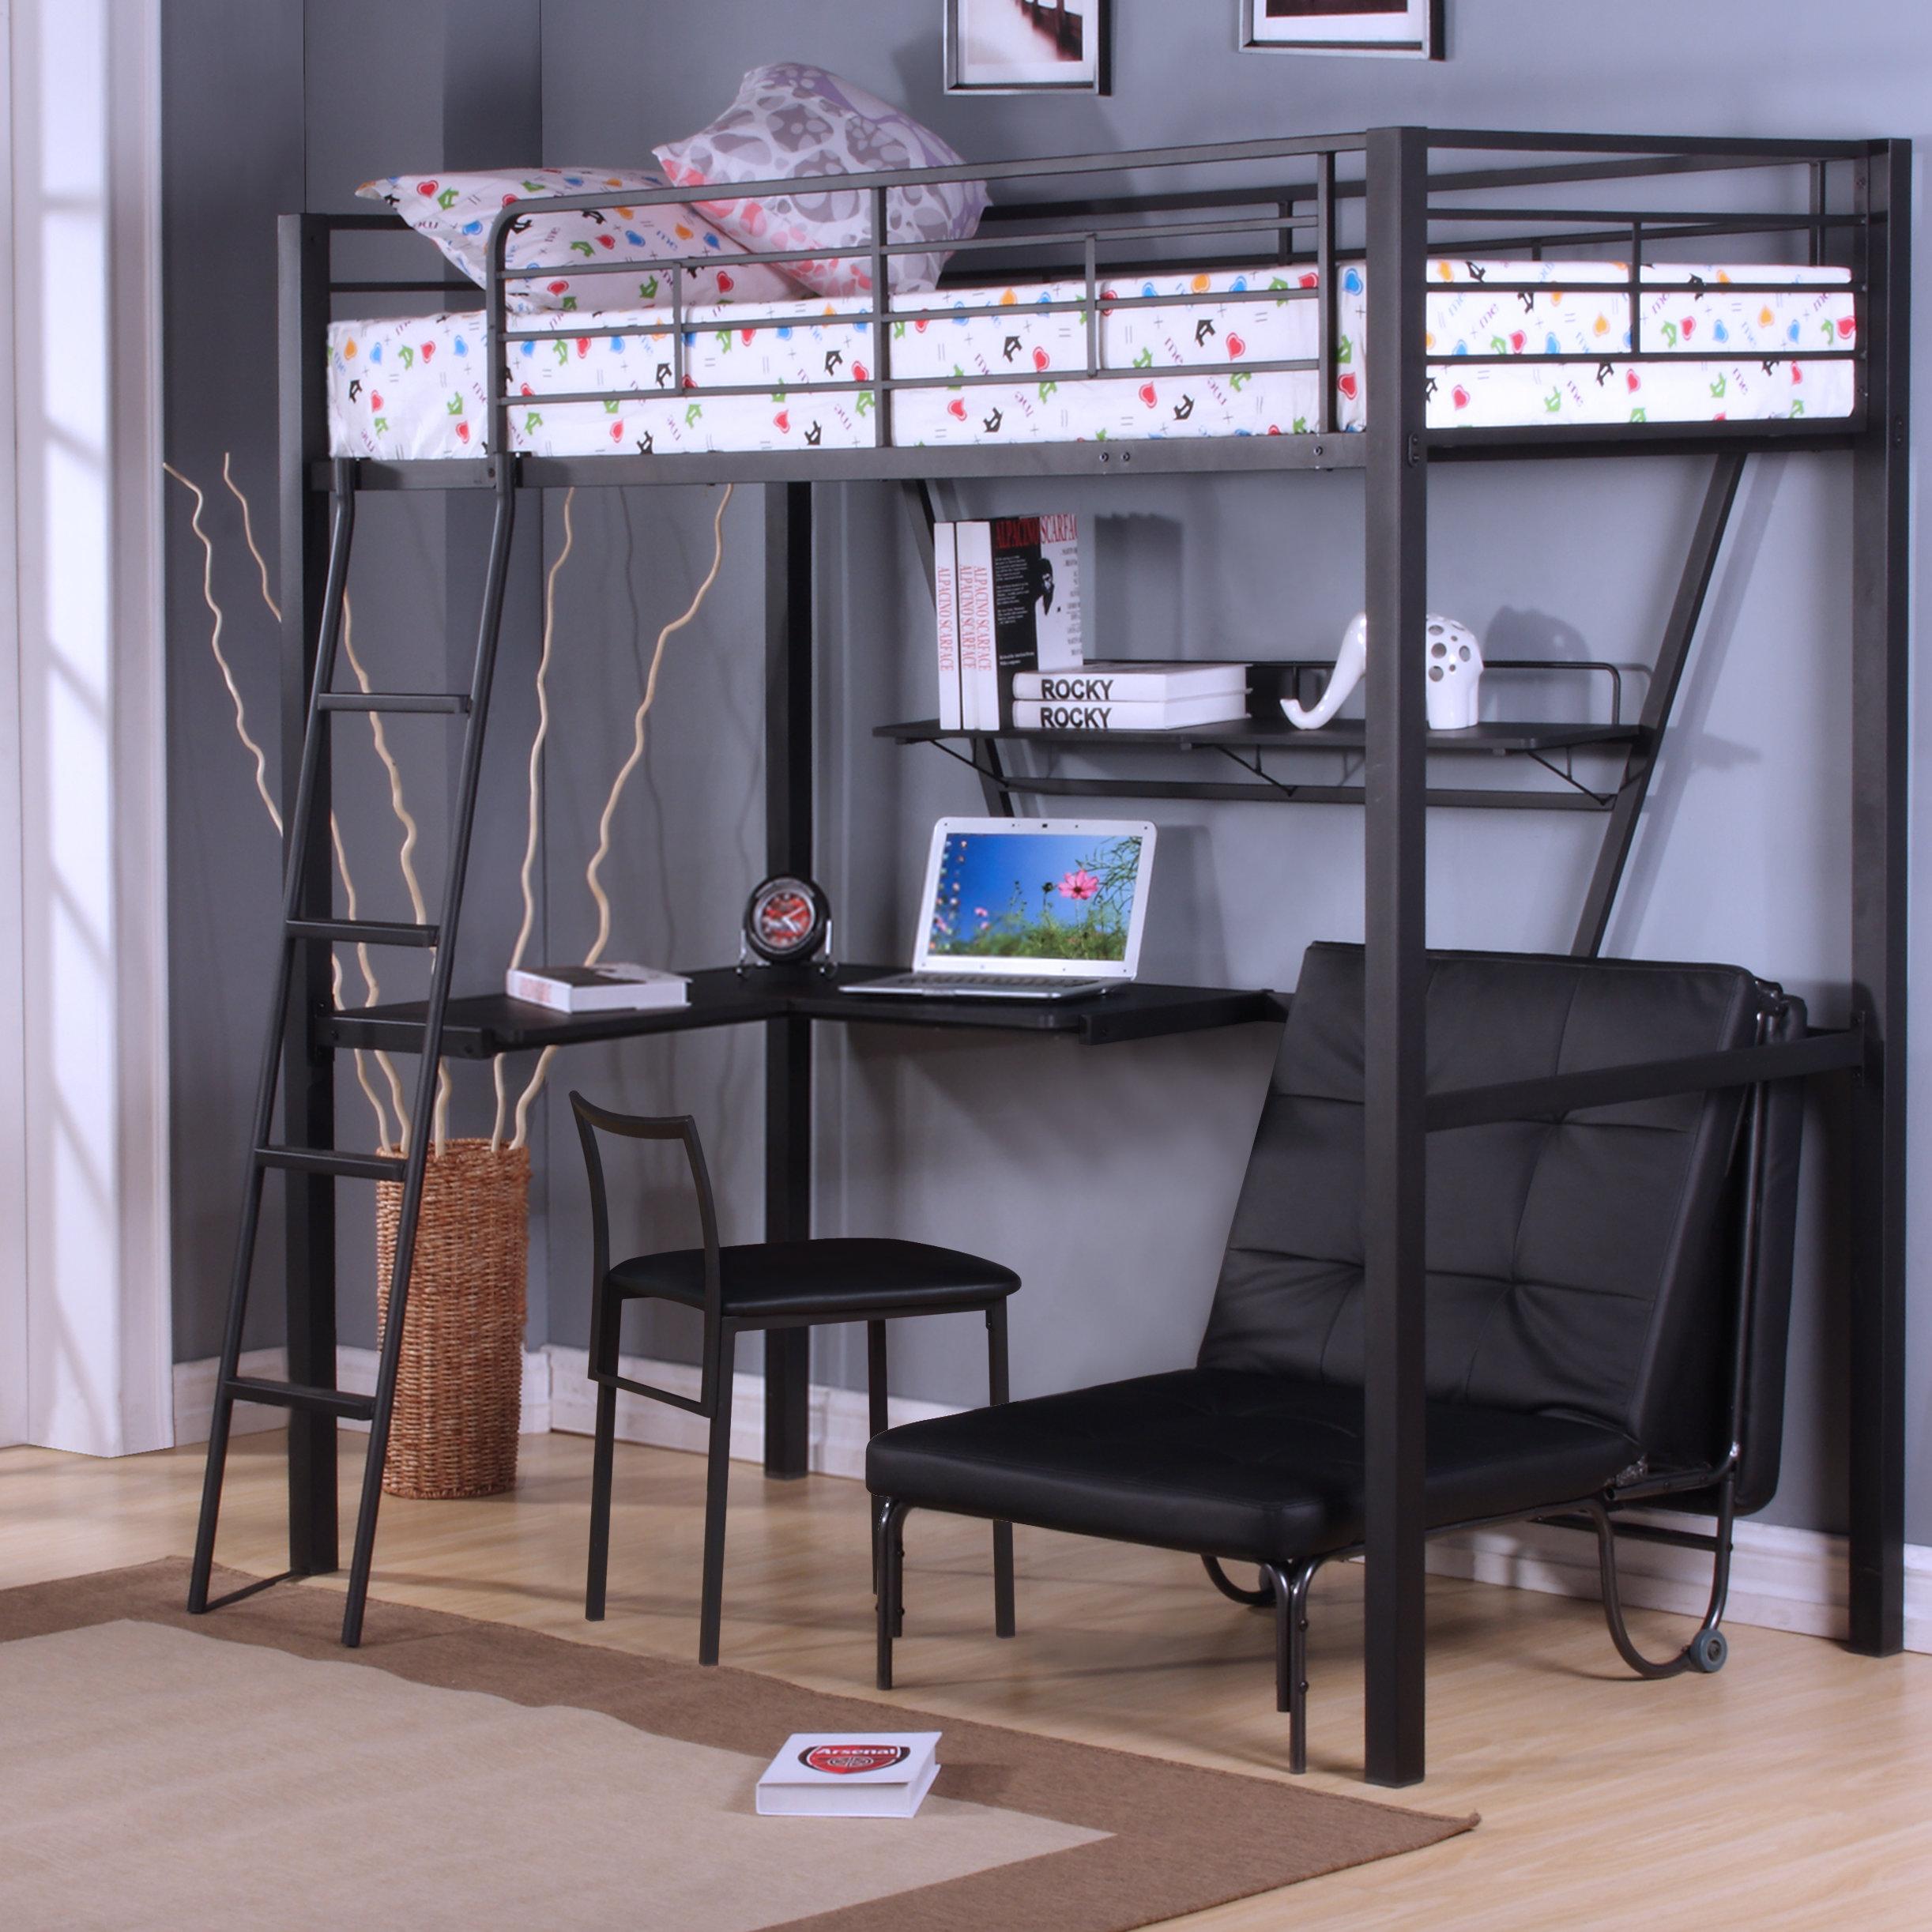 bunk beds with desk acme furniture senon loft bed with desk u0026 reviews   wayfair GWKEDUN